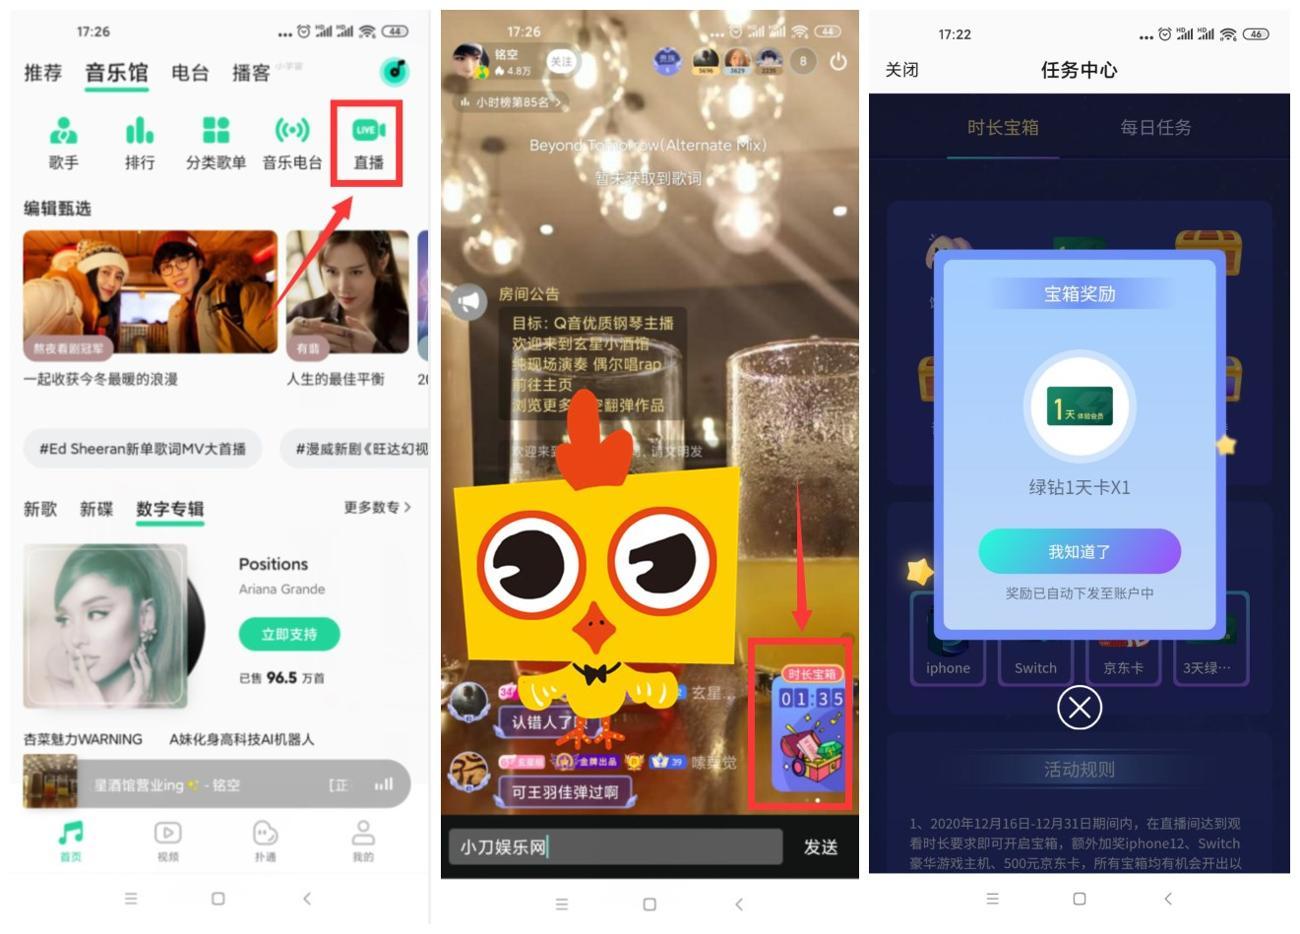 QQ音乐老用户领1~3天绿钻-亿动工作室's Blog